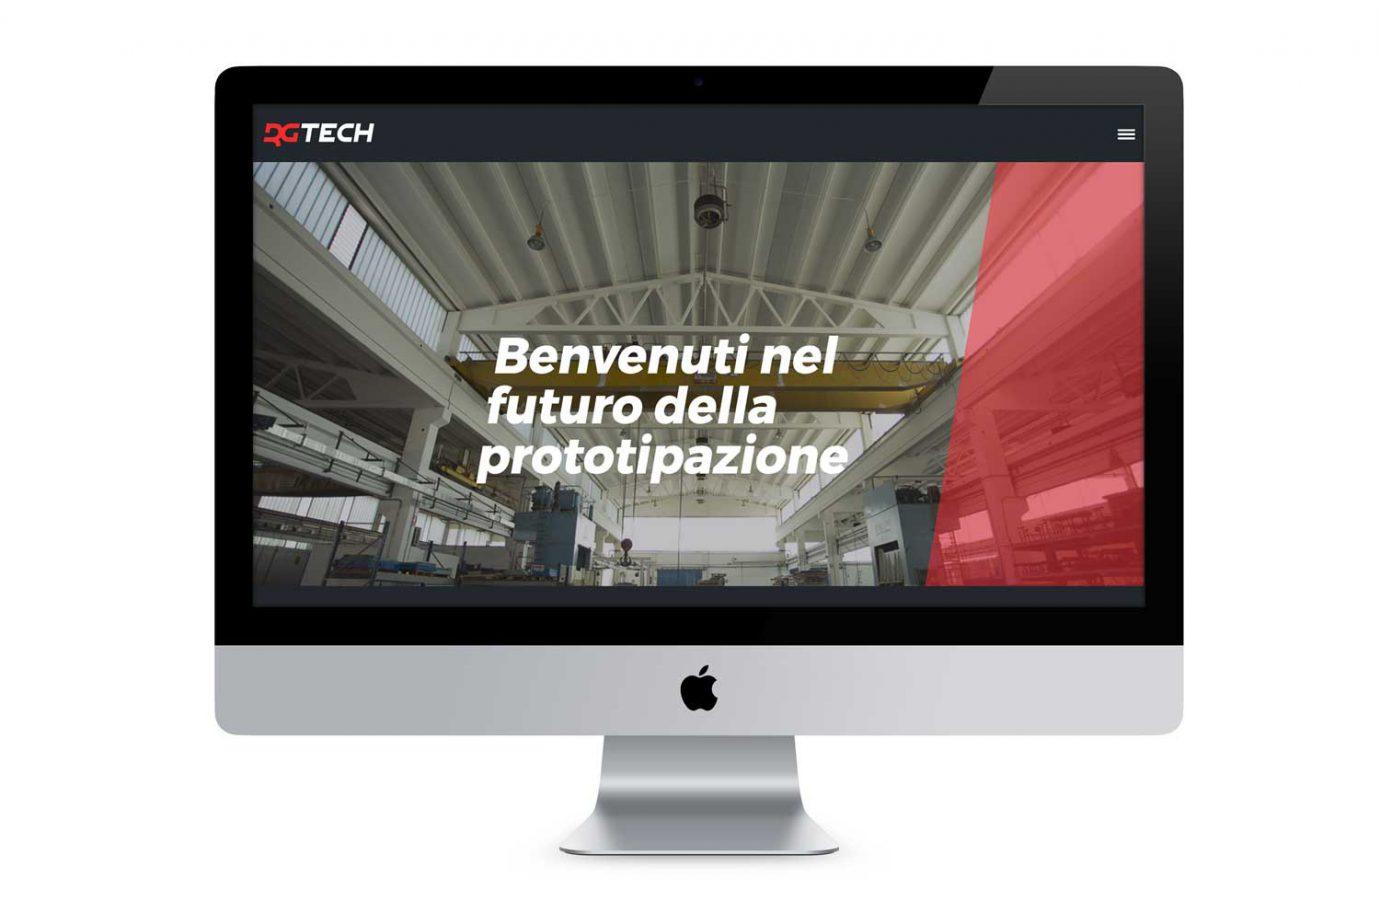 WillBe - web design Rgtech desktop